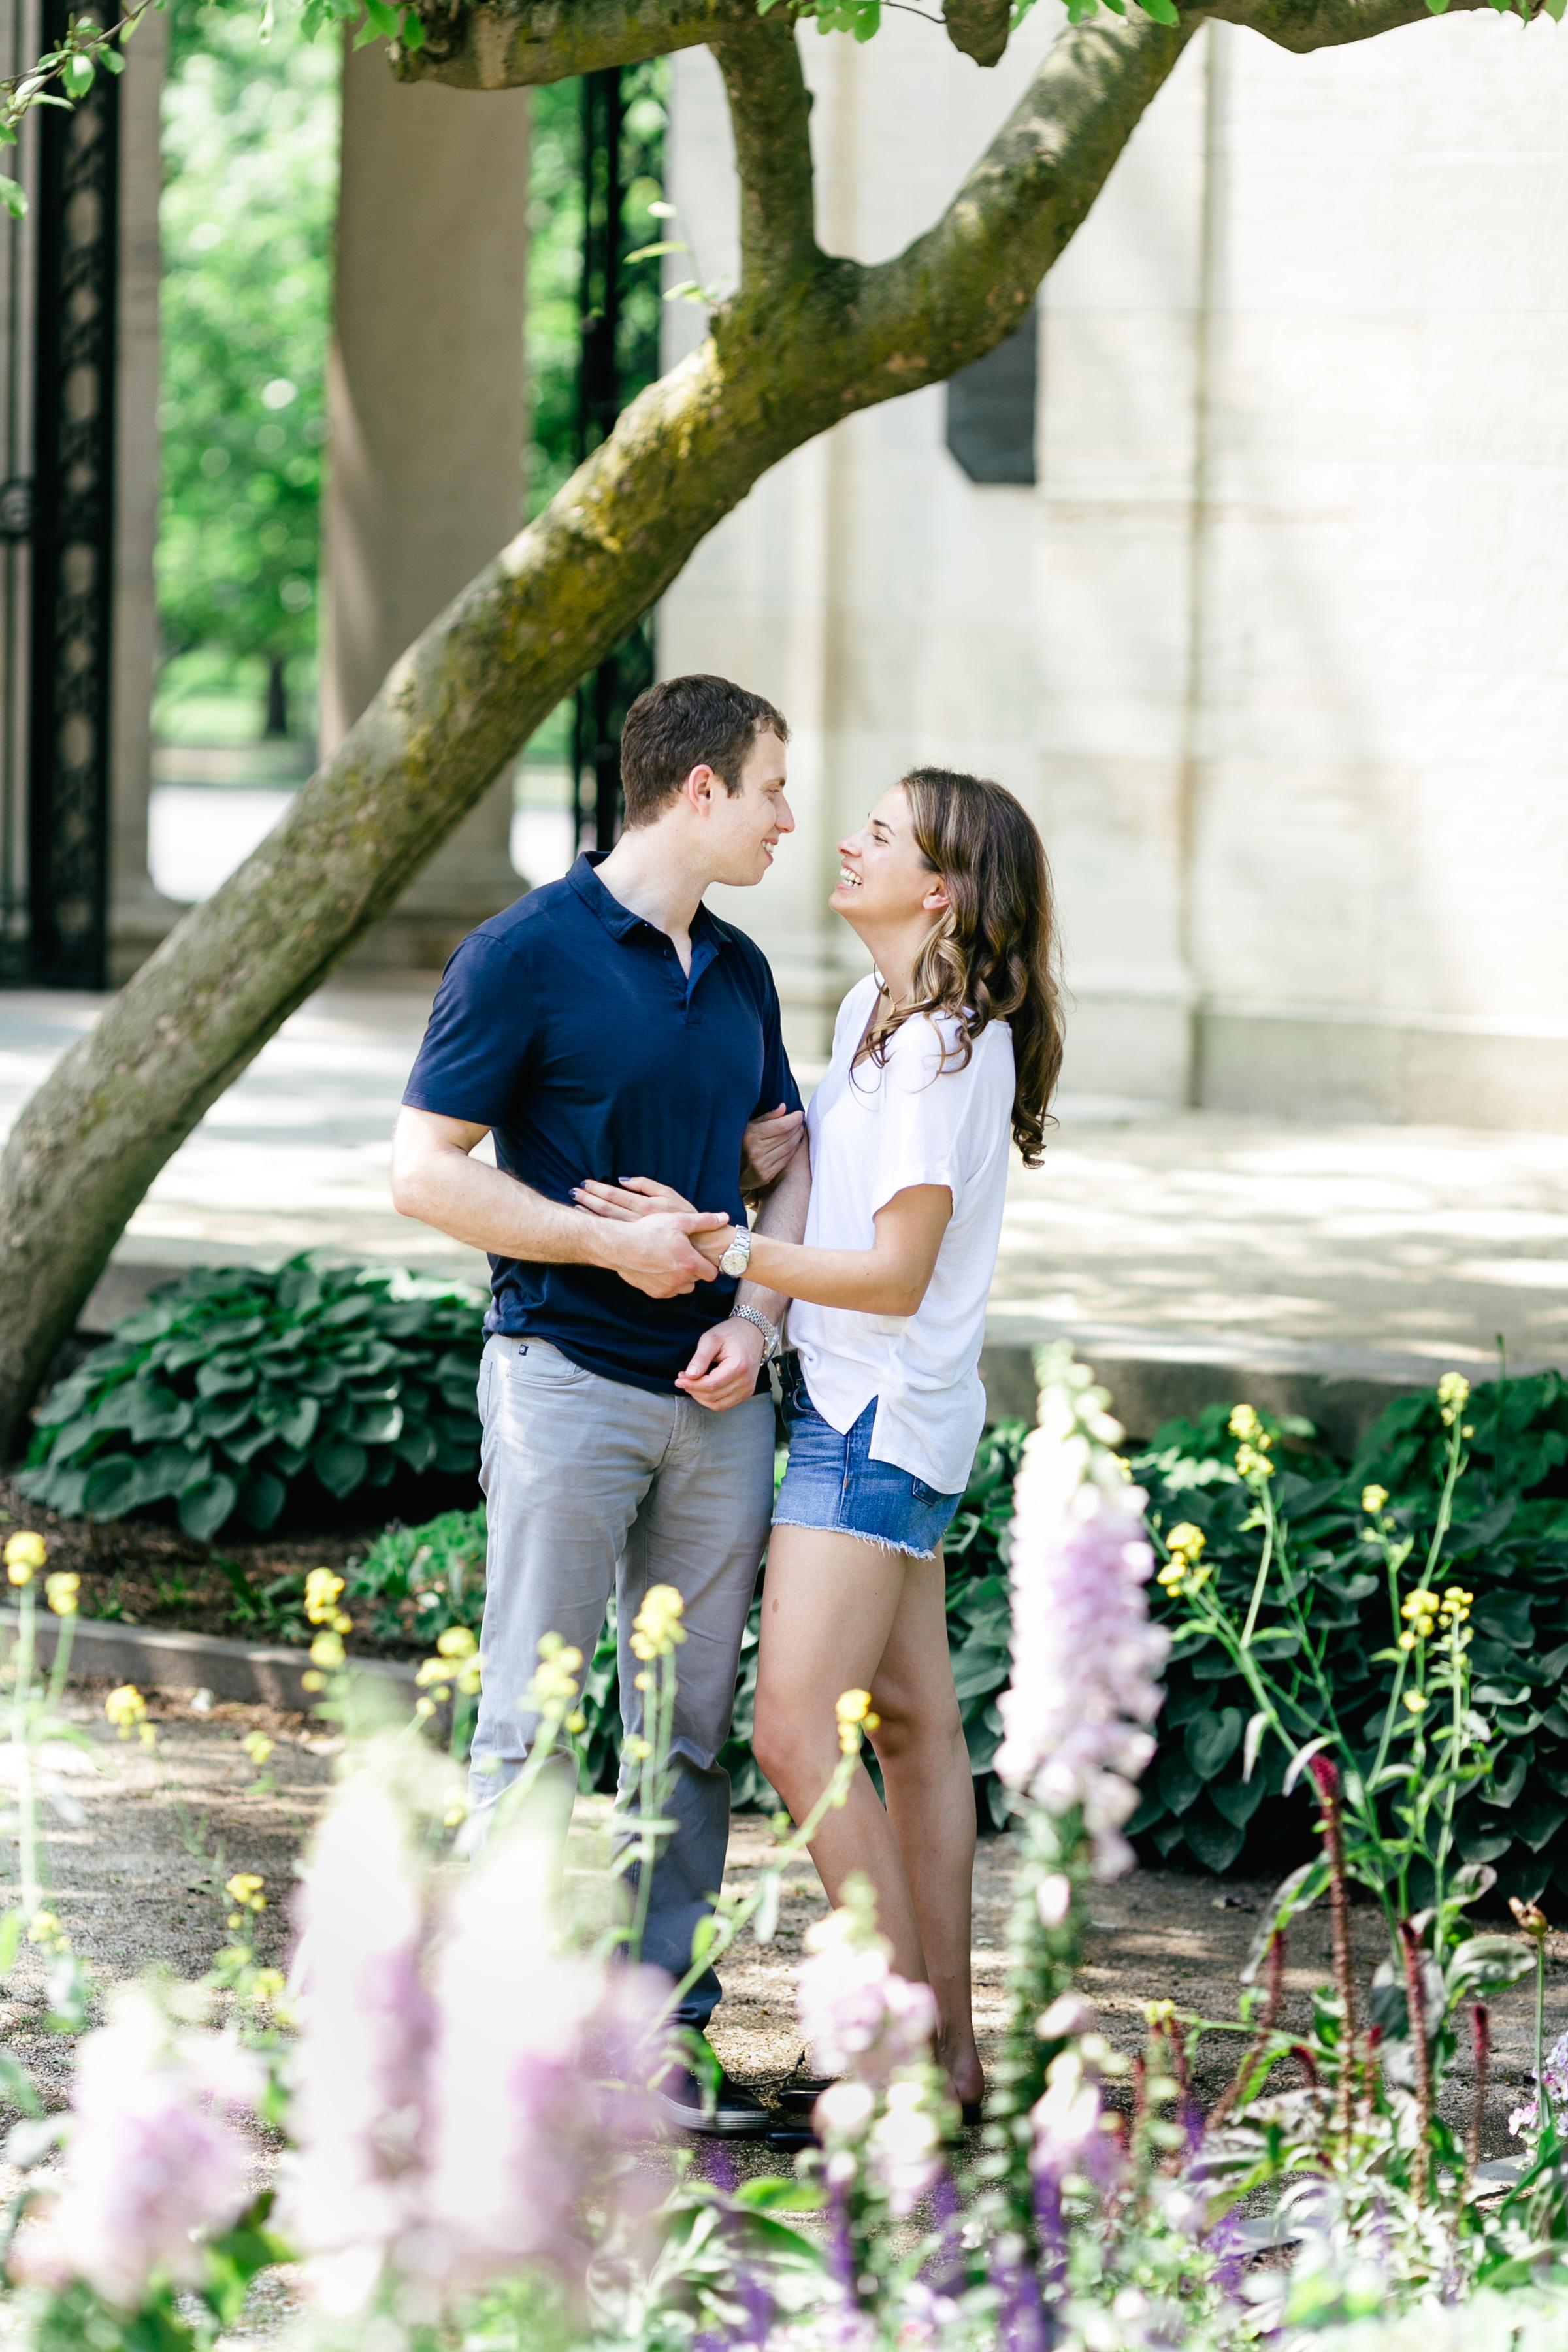 photography-natural-candid-engaged-proposal-philadelphia-wedding-rodin museum-barnes foundation-parkway-modern-lifestyle-15.JPG